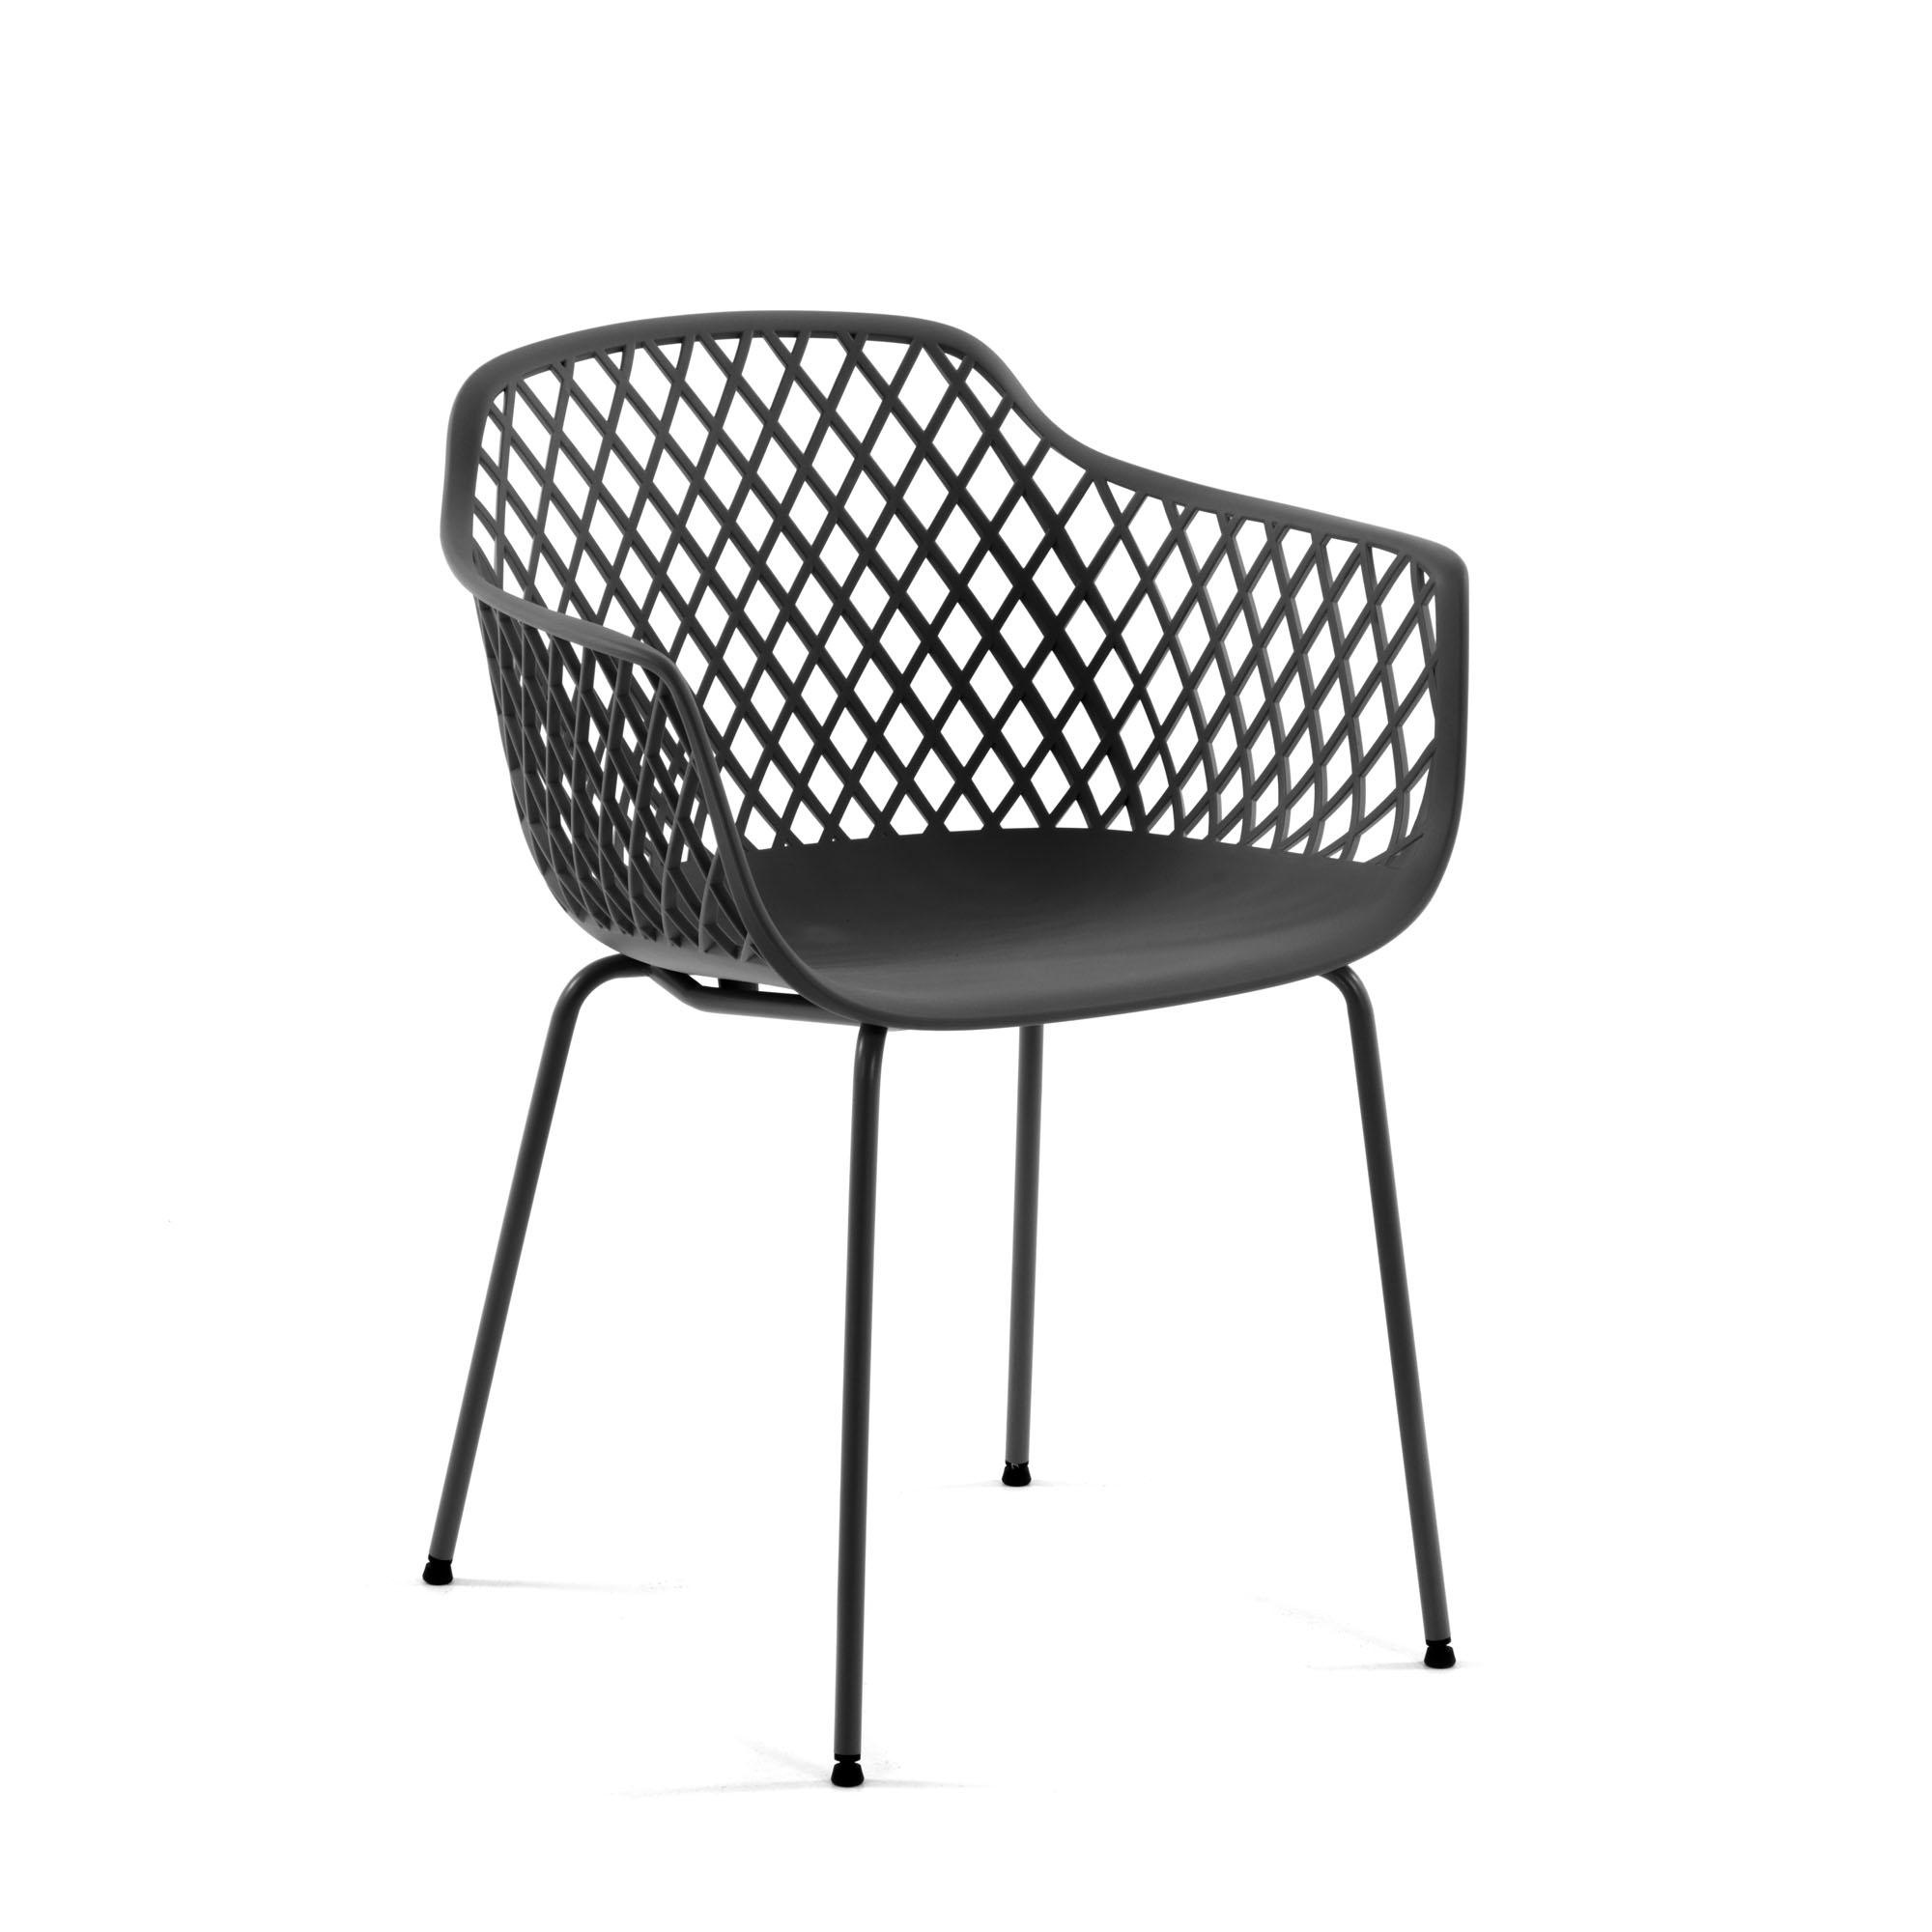 Стул-кресло quinn (la forma) серый 60x80x55 см.